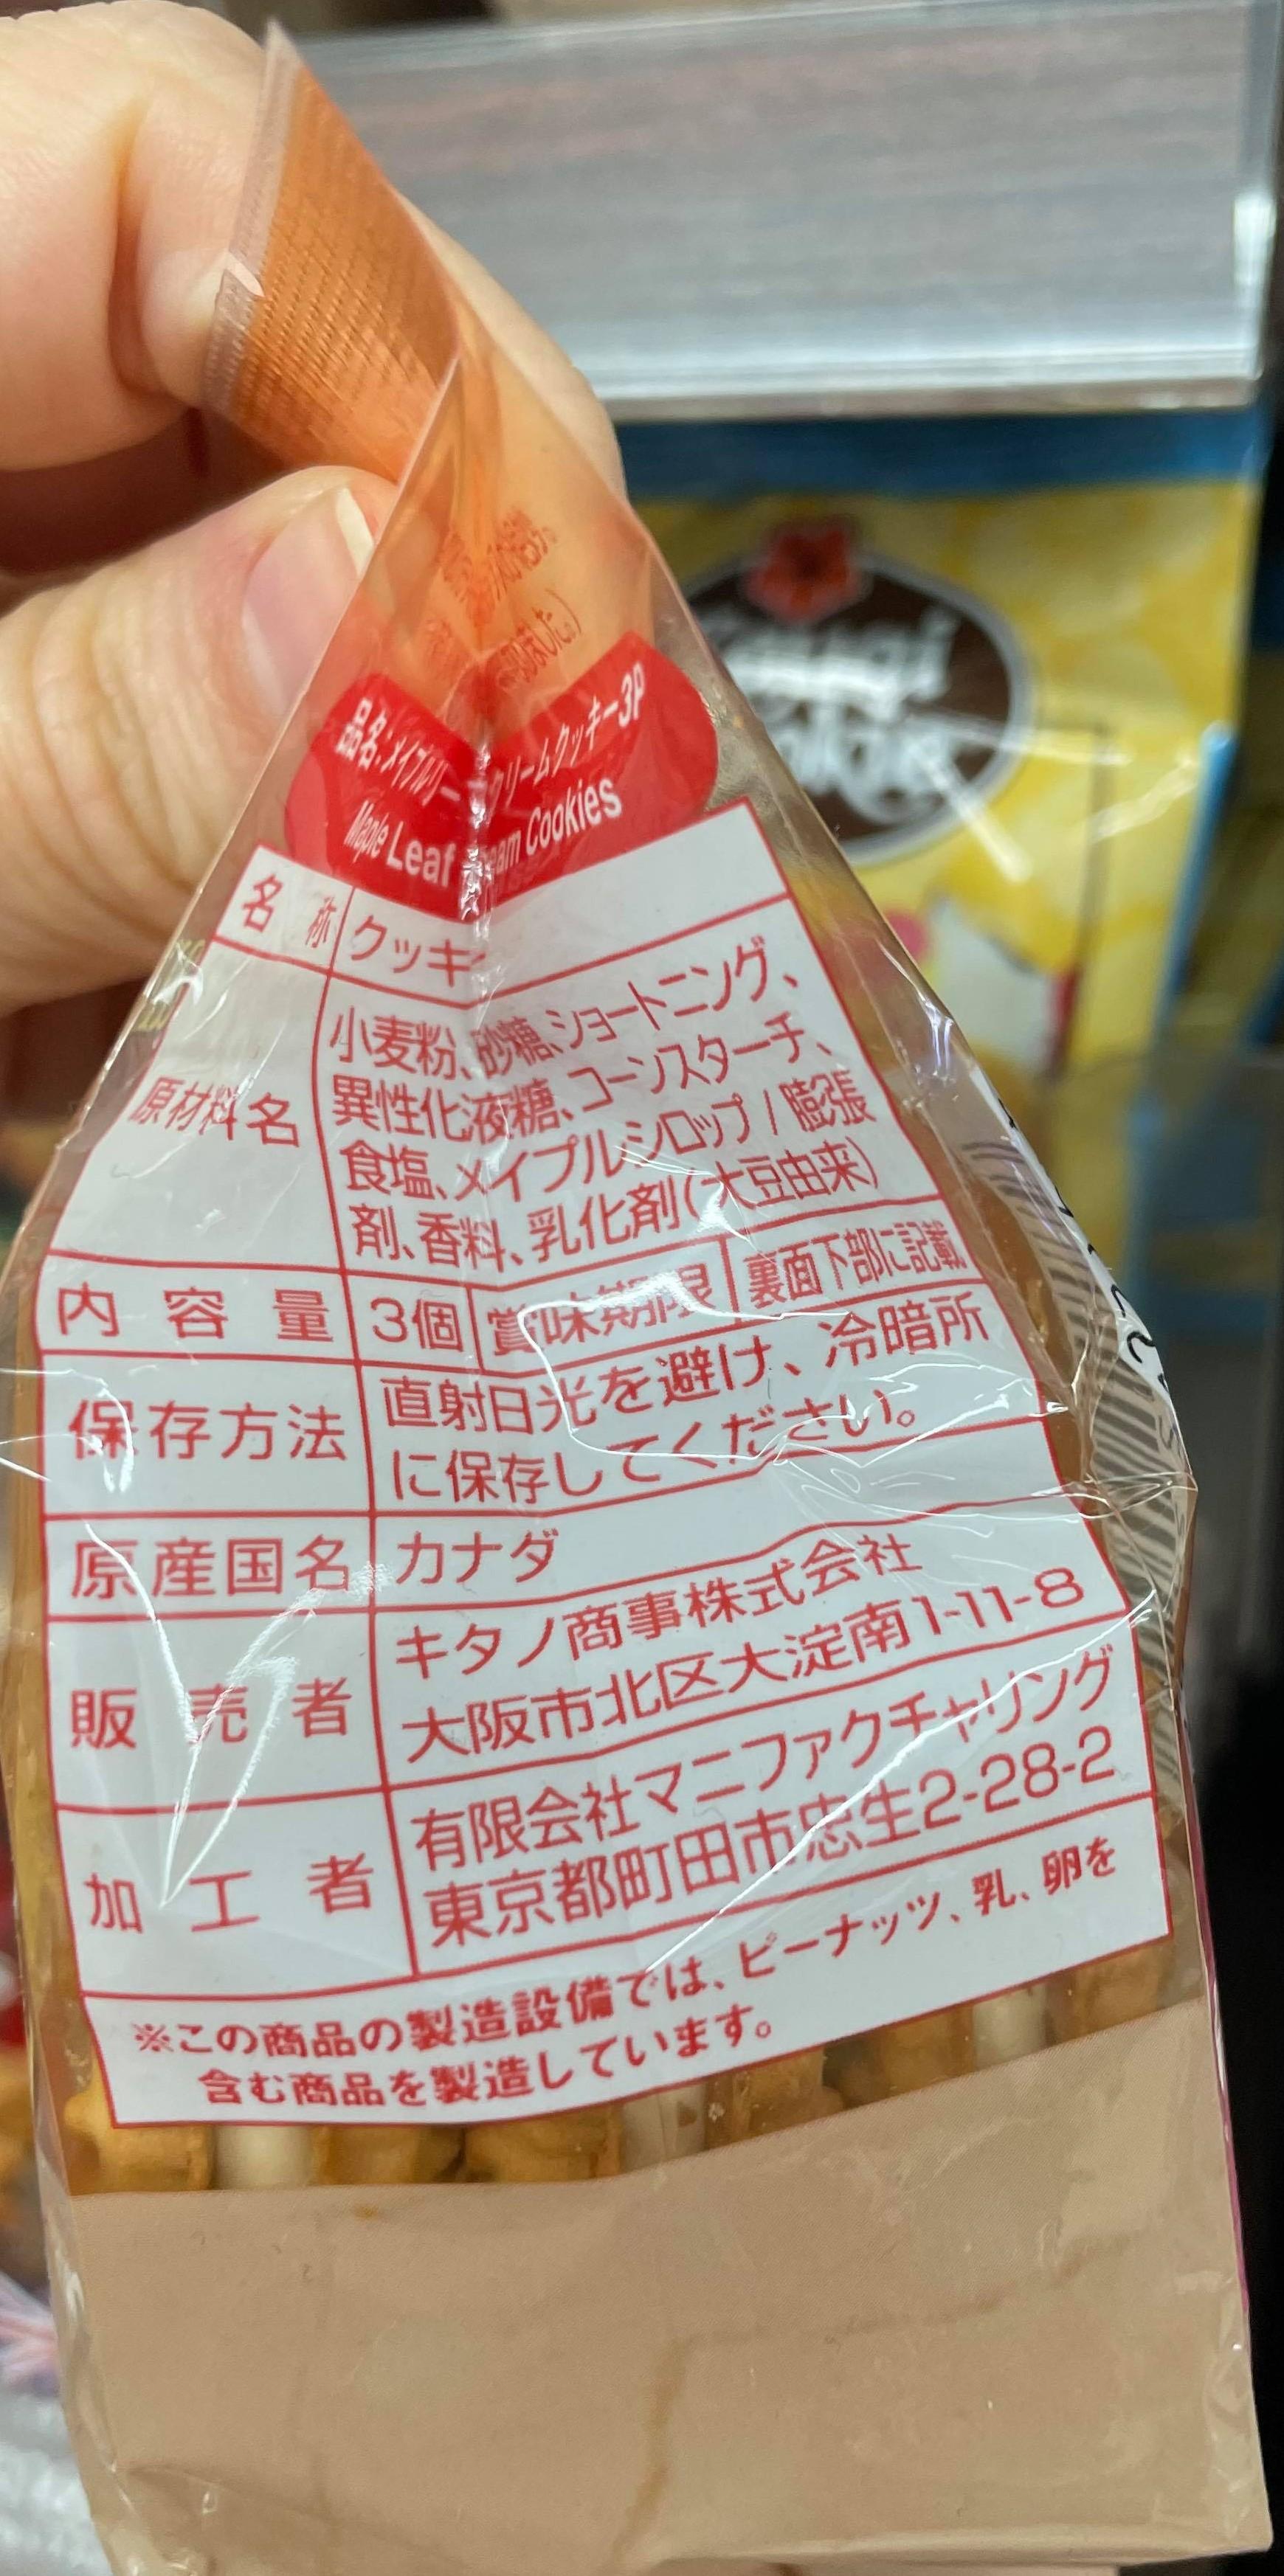 Taste Delight Maple Leaf Cream Cookies ingredient panel Natural Lawson